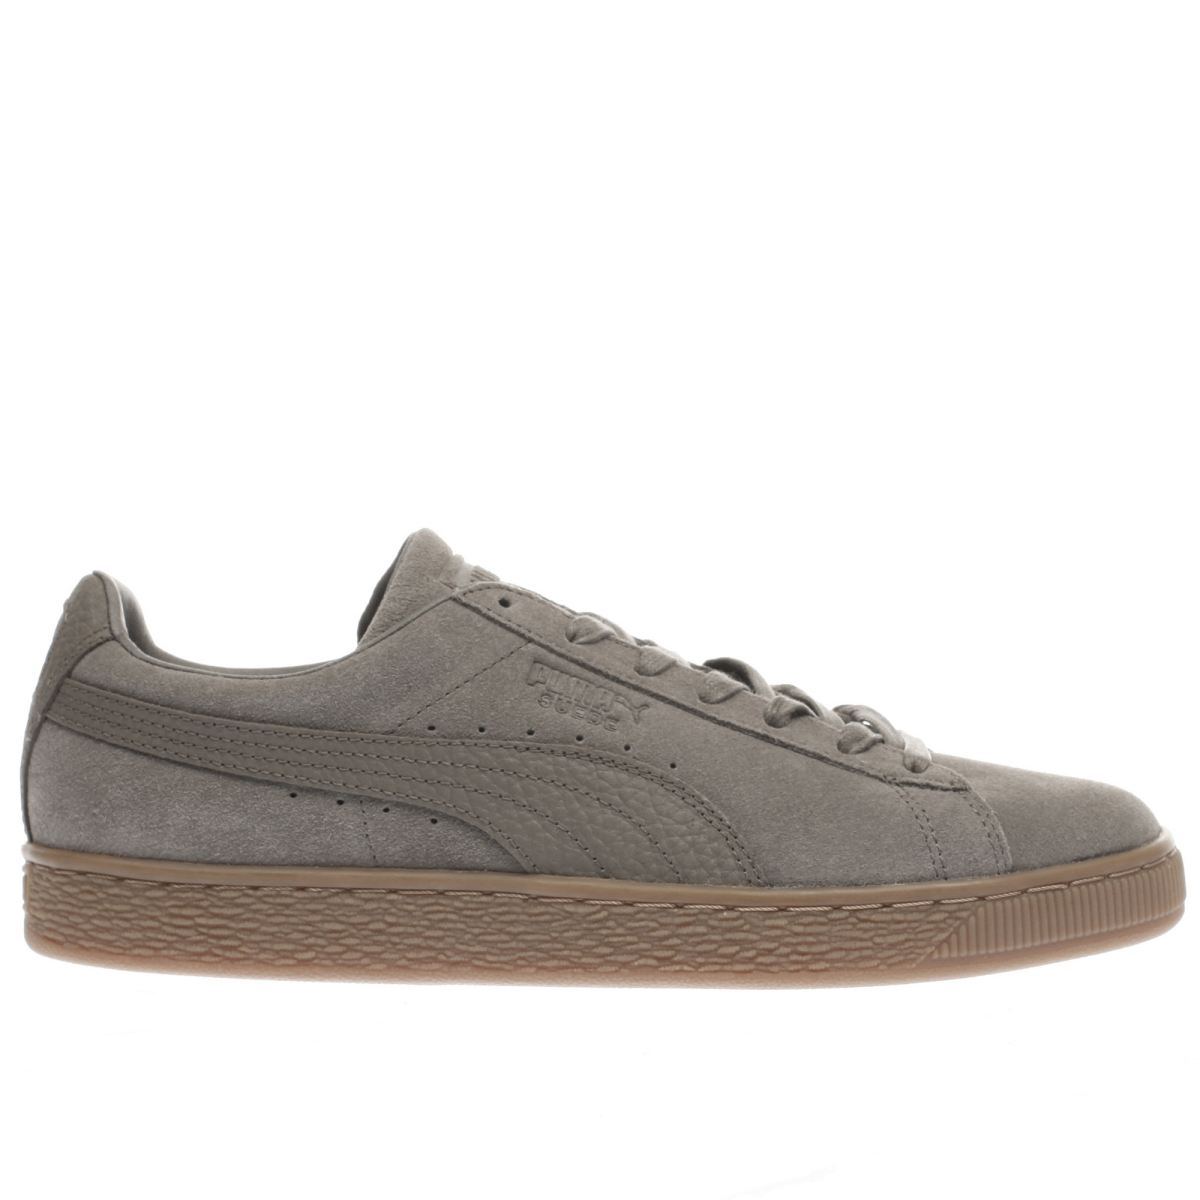 puma dark grey suede classic trainers